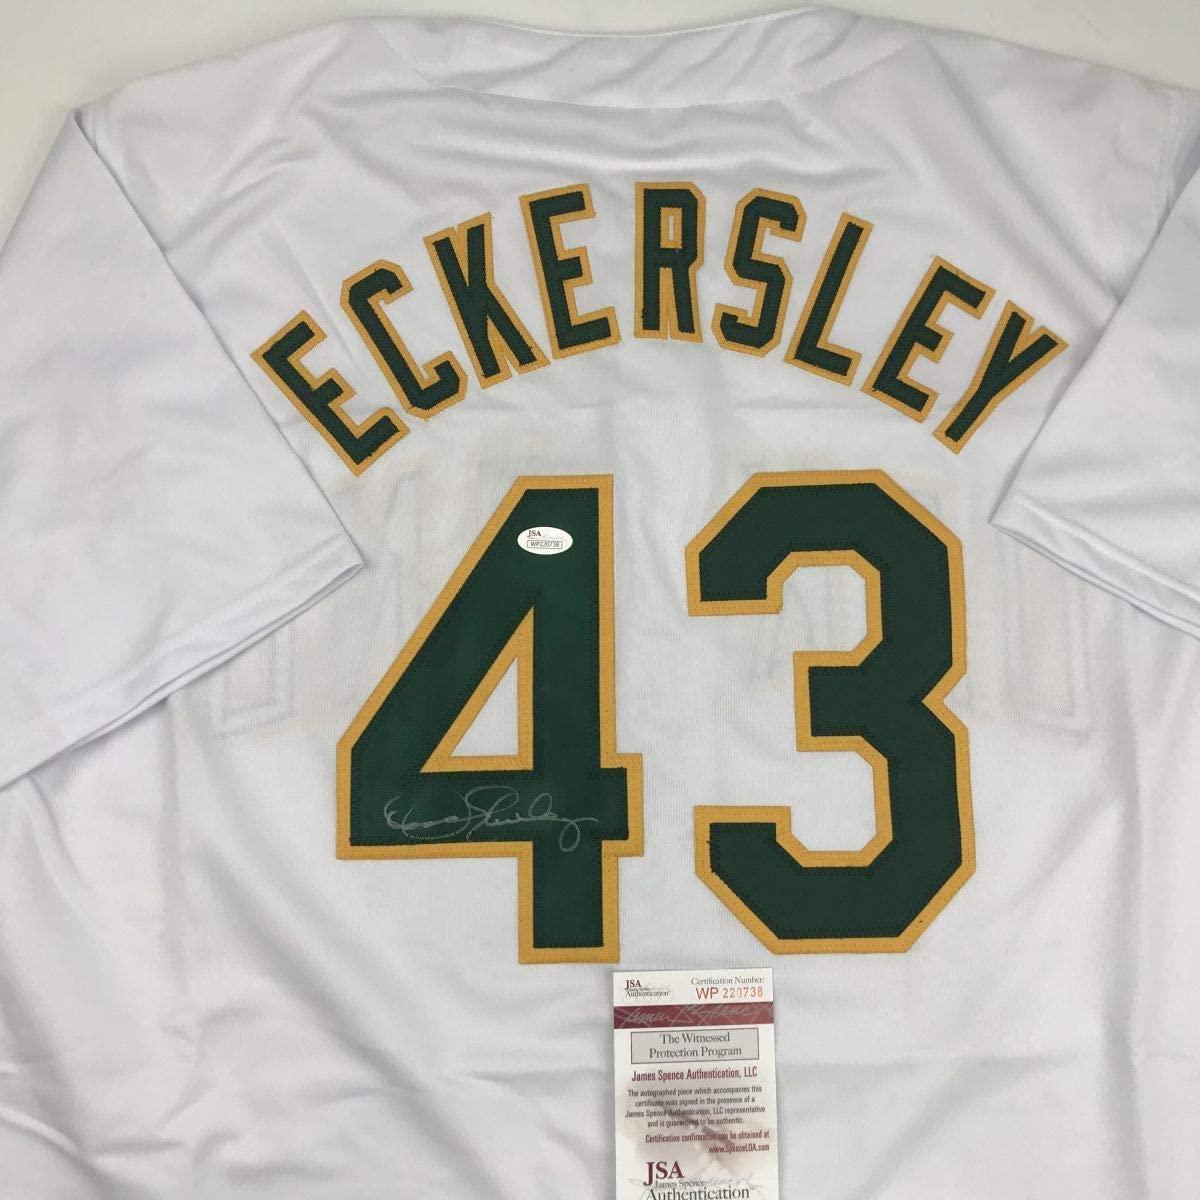 Autographed/Signed Dennis Eckersley Oakland White Baseball Jersey JSA COA